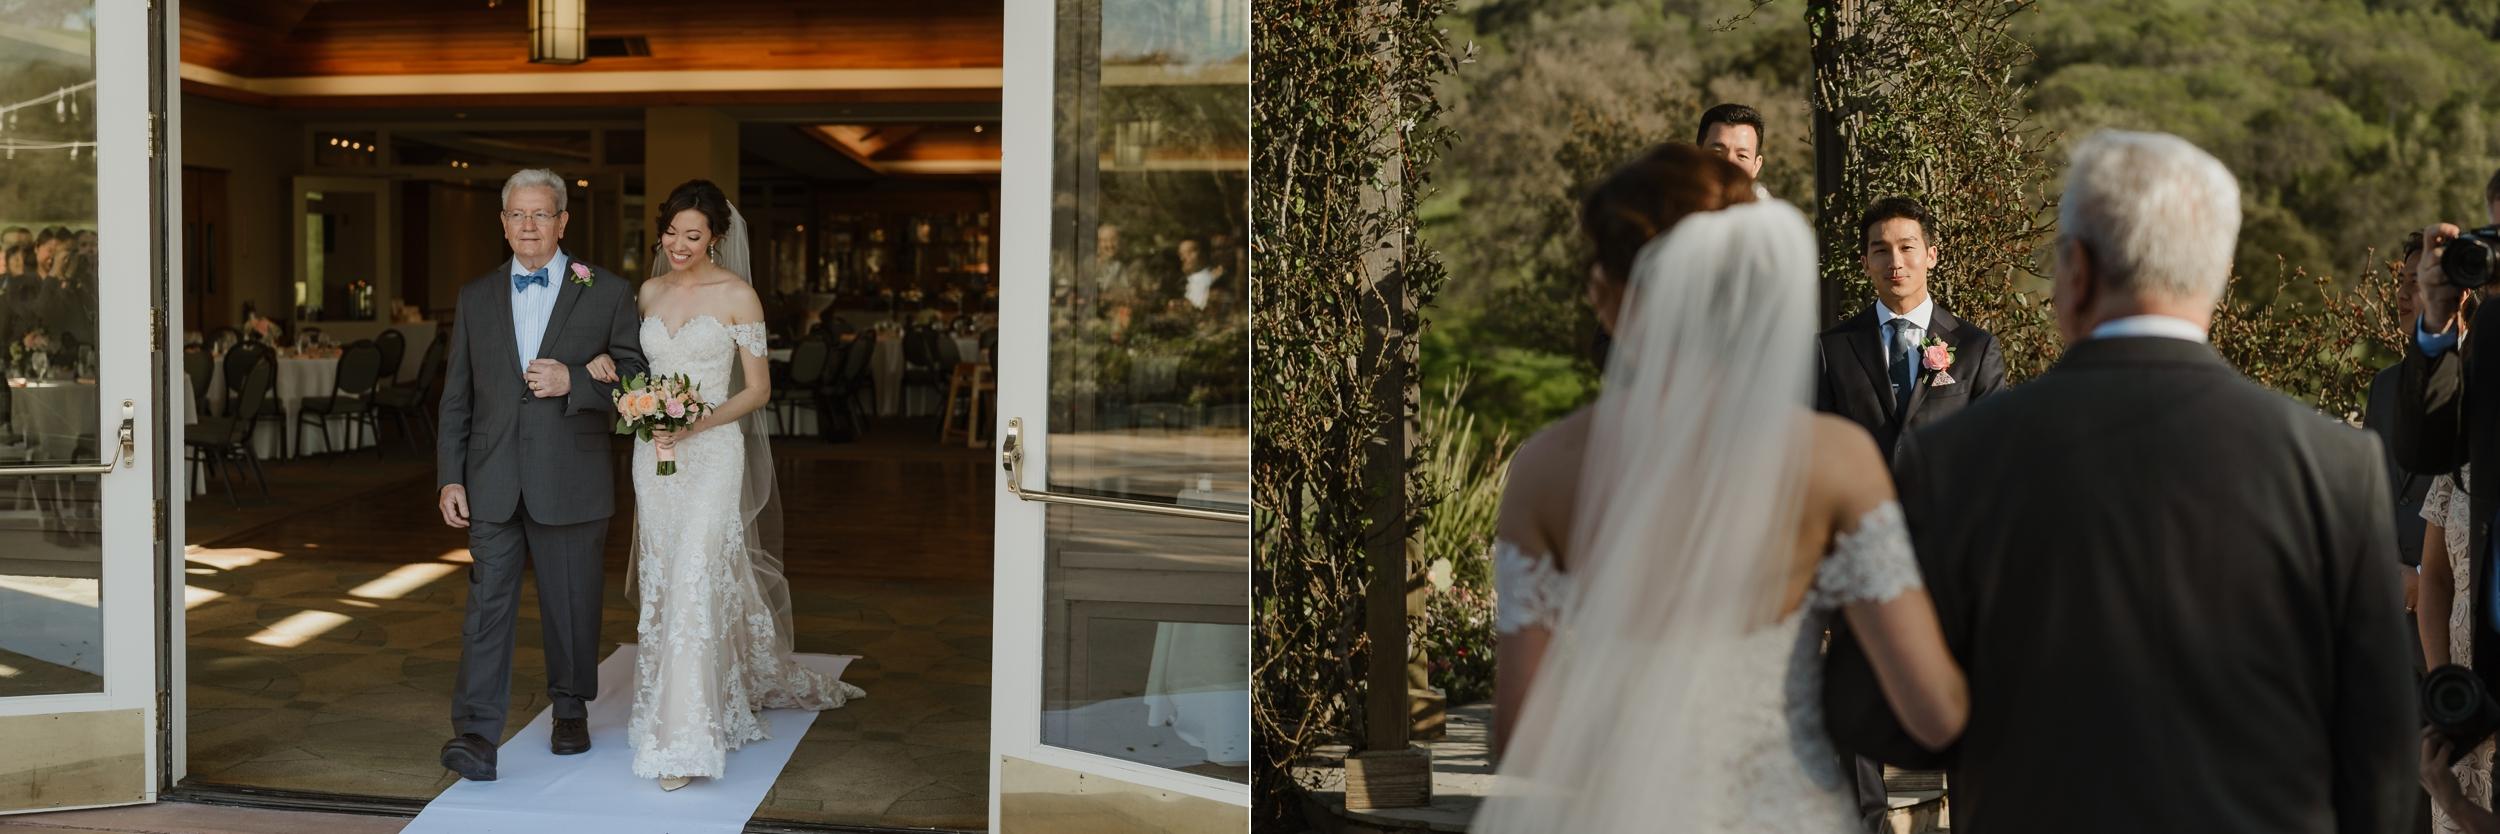 032san-jose-cinnabar-hills-golf-course-wedding-vivianchen-208_WEB.jpg